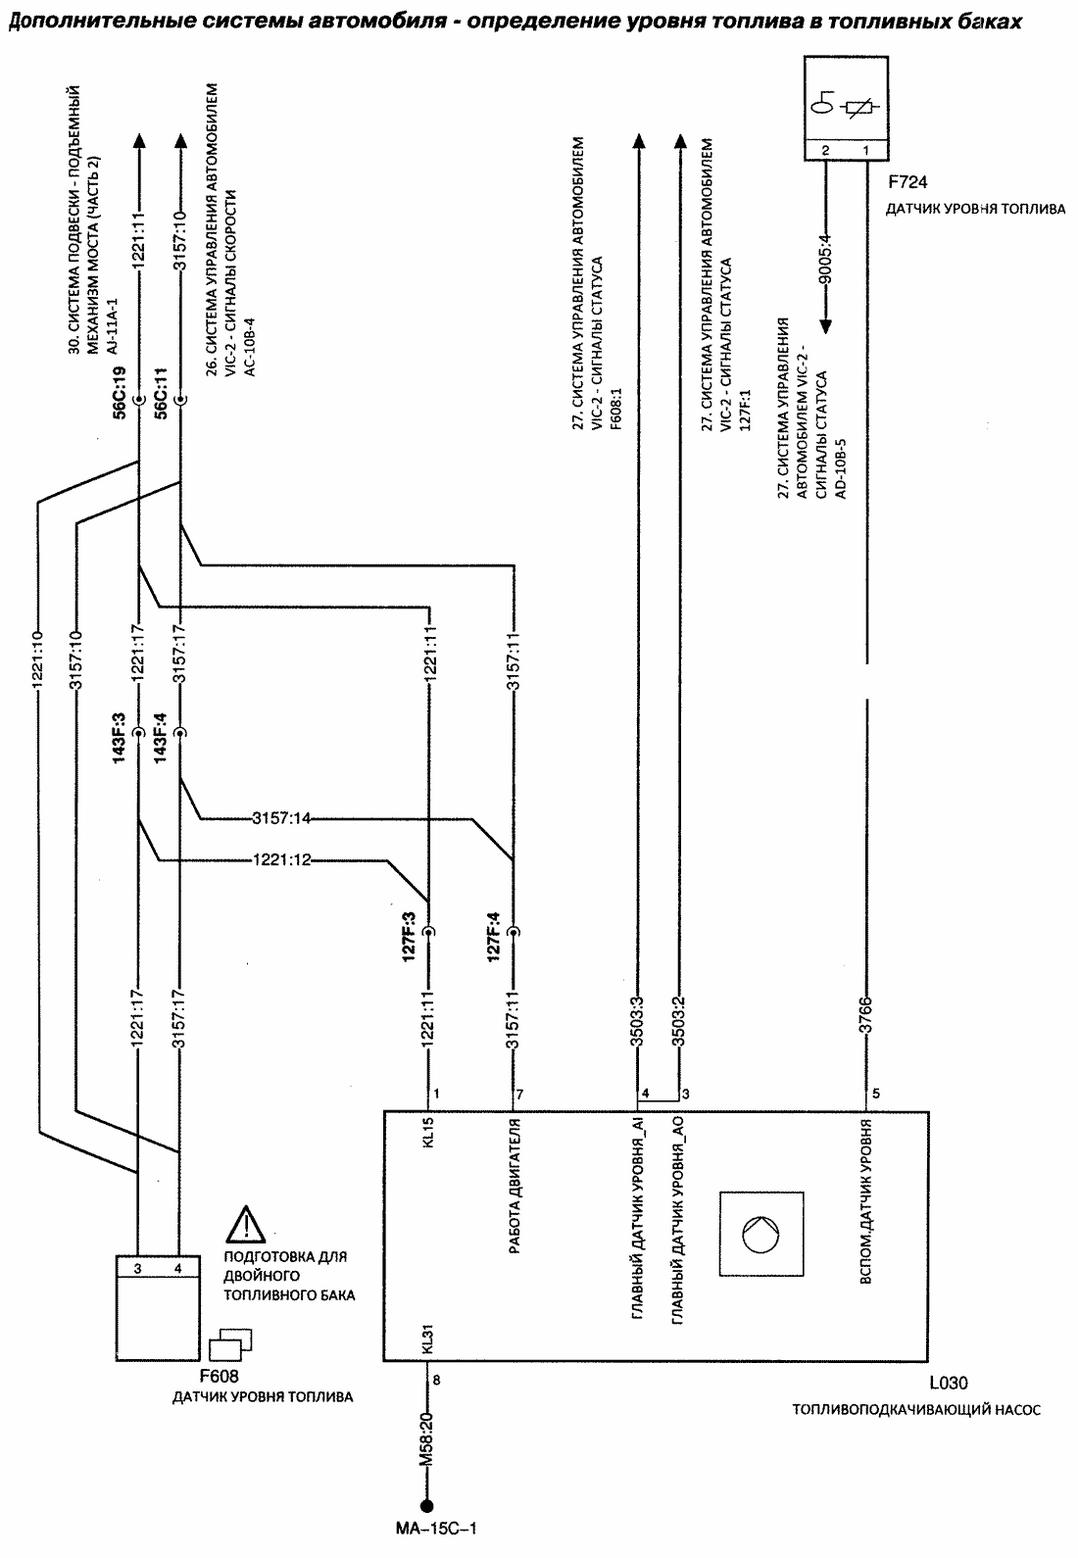 Конспект урока алгоритм блок схема 2 класс фото 30